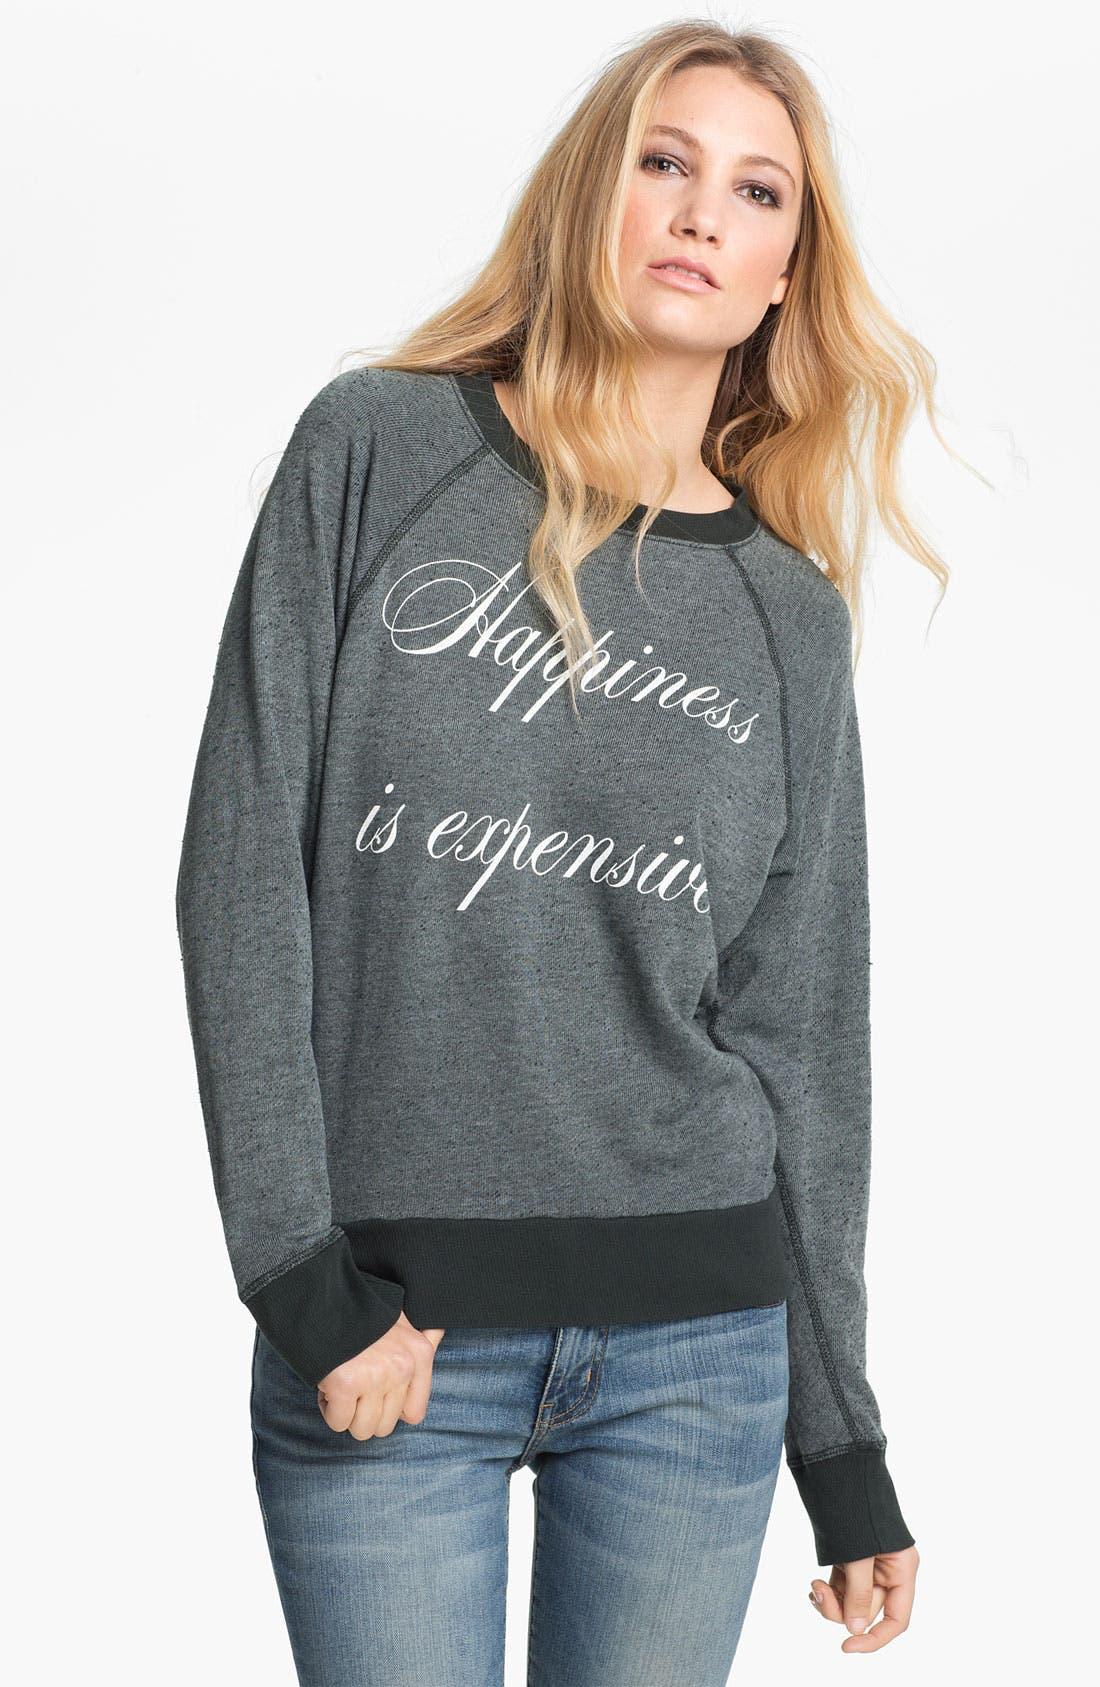 Main Image - Wildfox 'Happiness Is Expensive' Graphic Sweatshirt